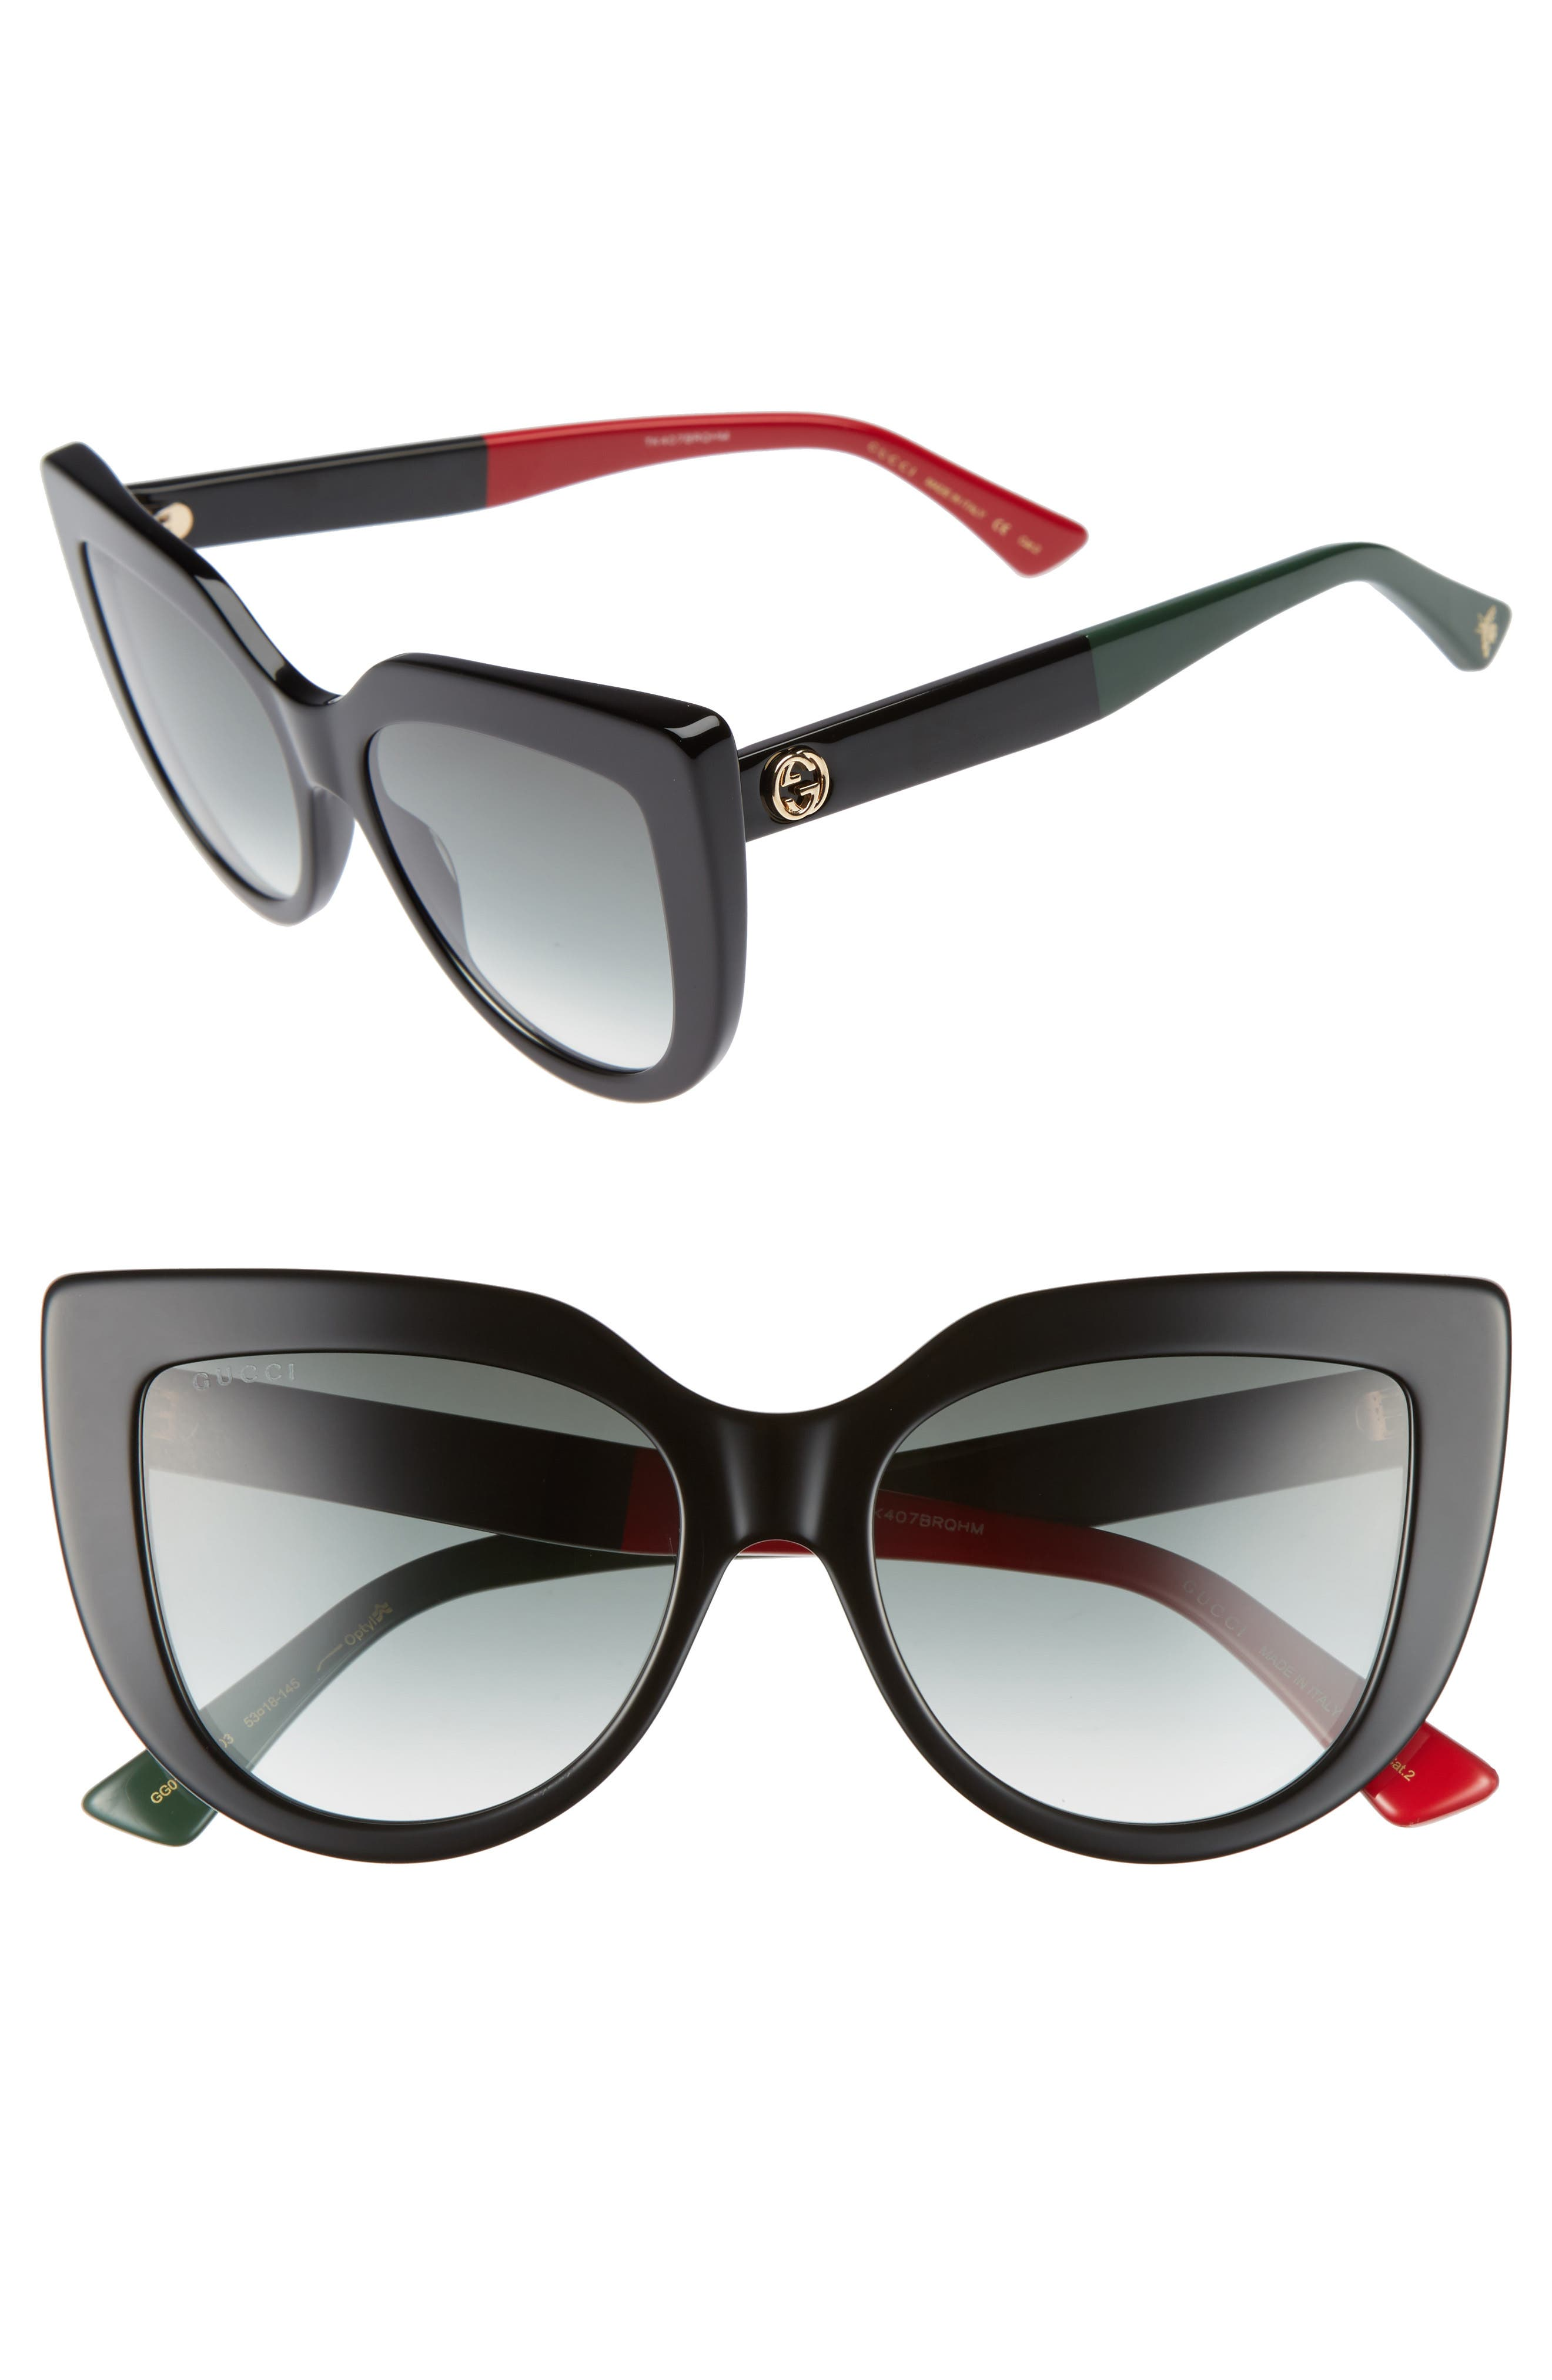 2b8dc8a5307 Gucci 5m Cat Eye Sunglasses - Black